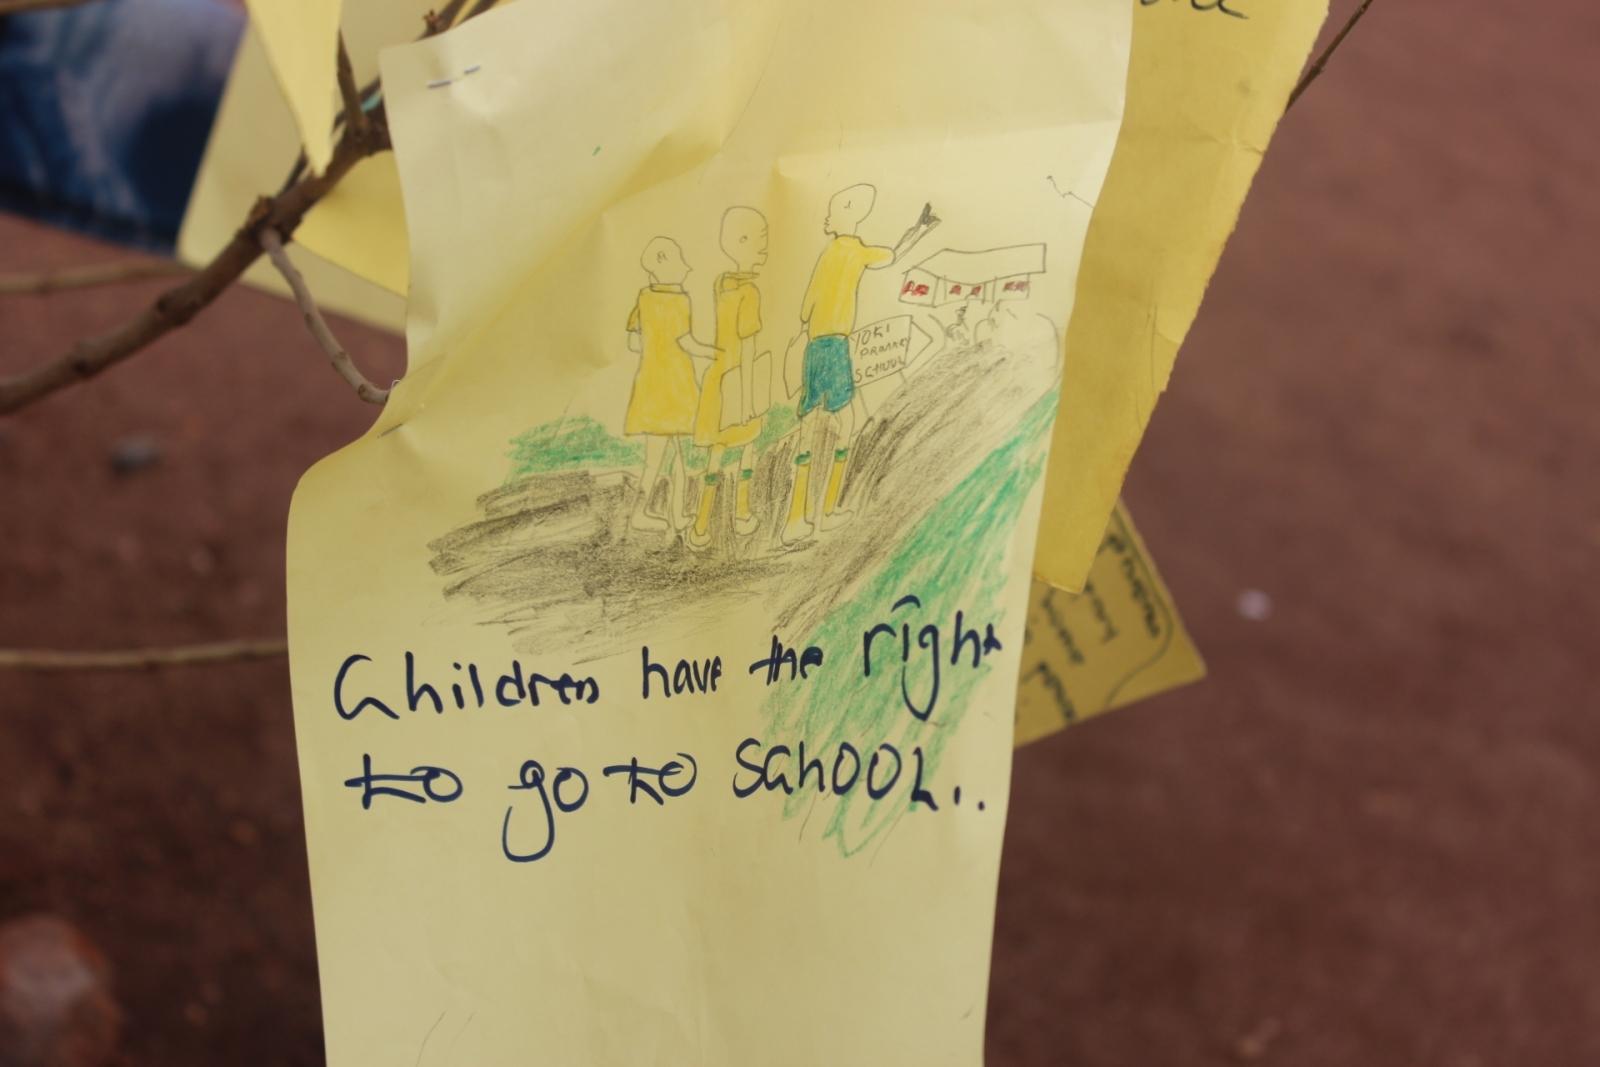 South Sudan children